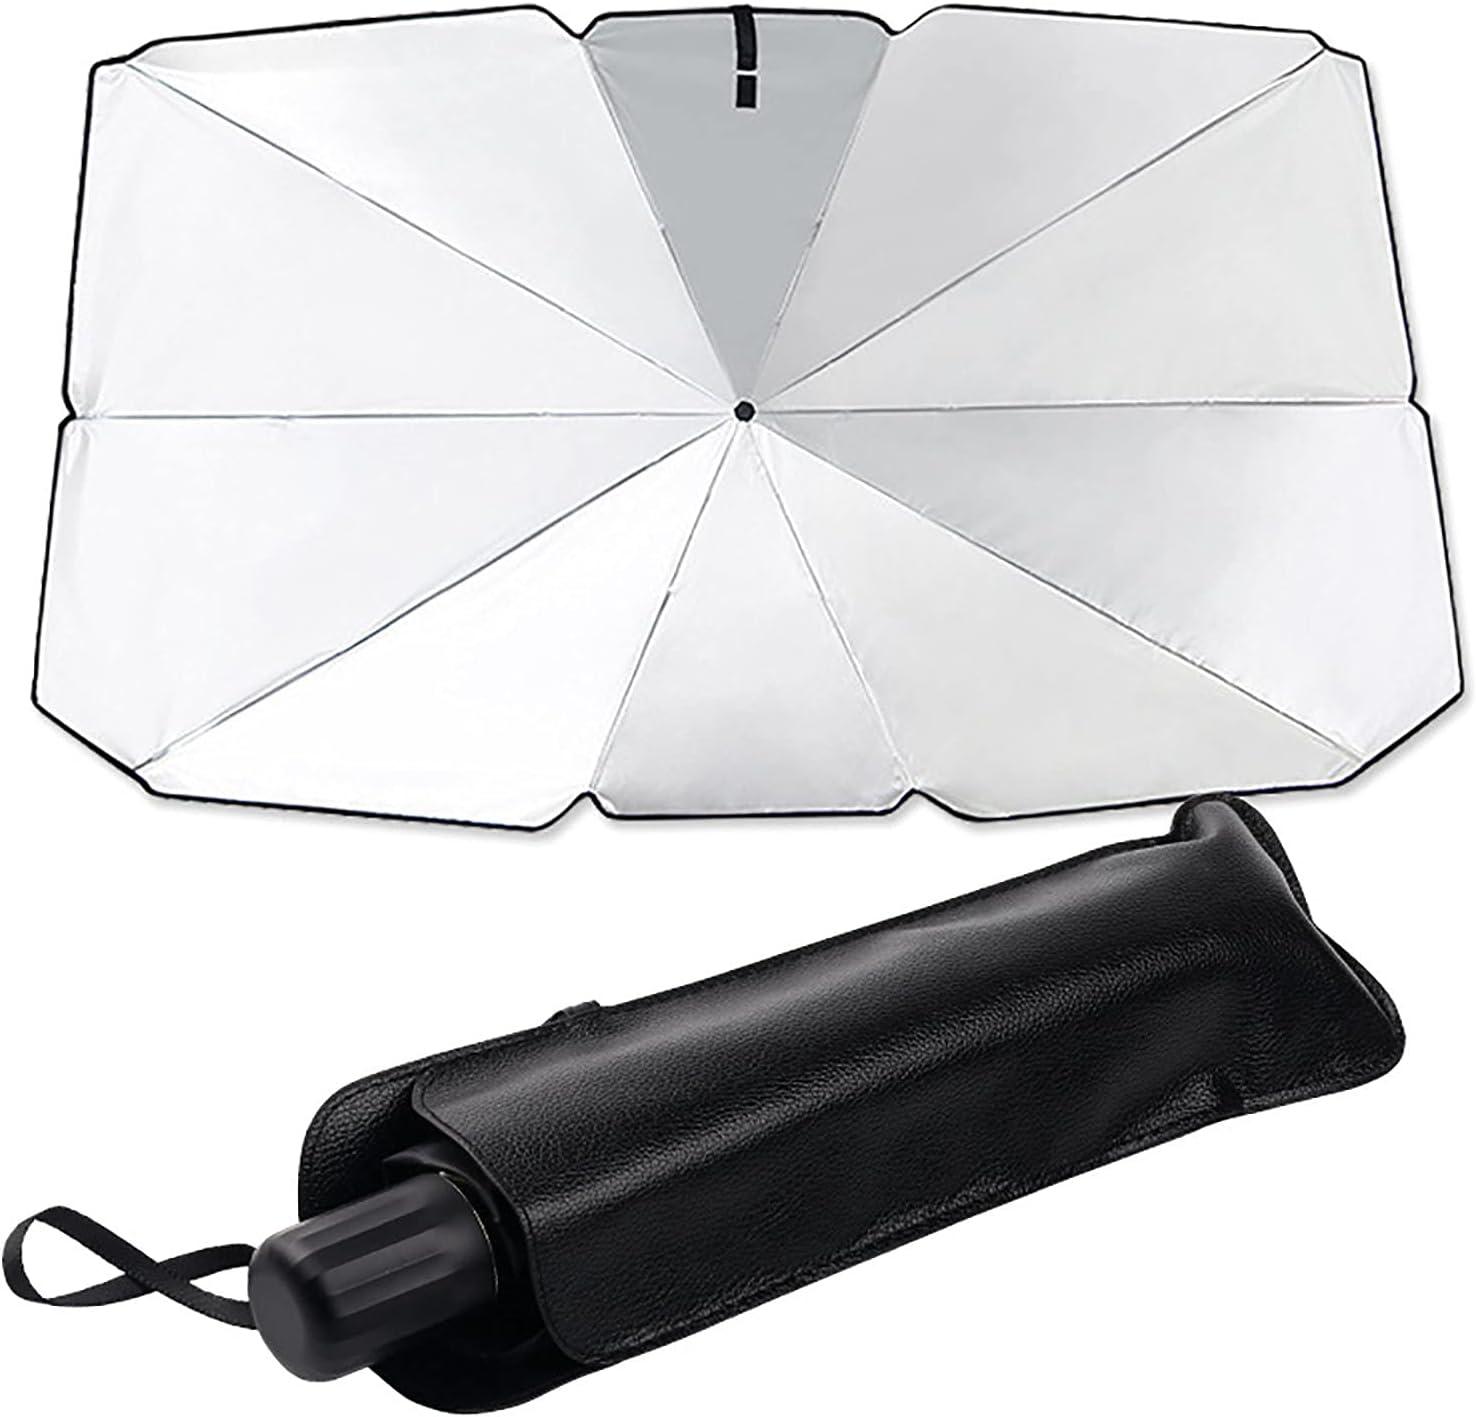 Store Psy Car Windshield Sunshade Don't miss the campaign Umbrella Visor Foldable Sun Fron